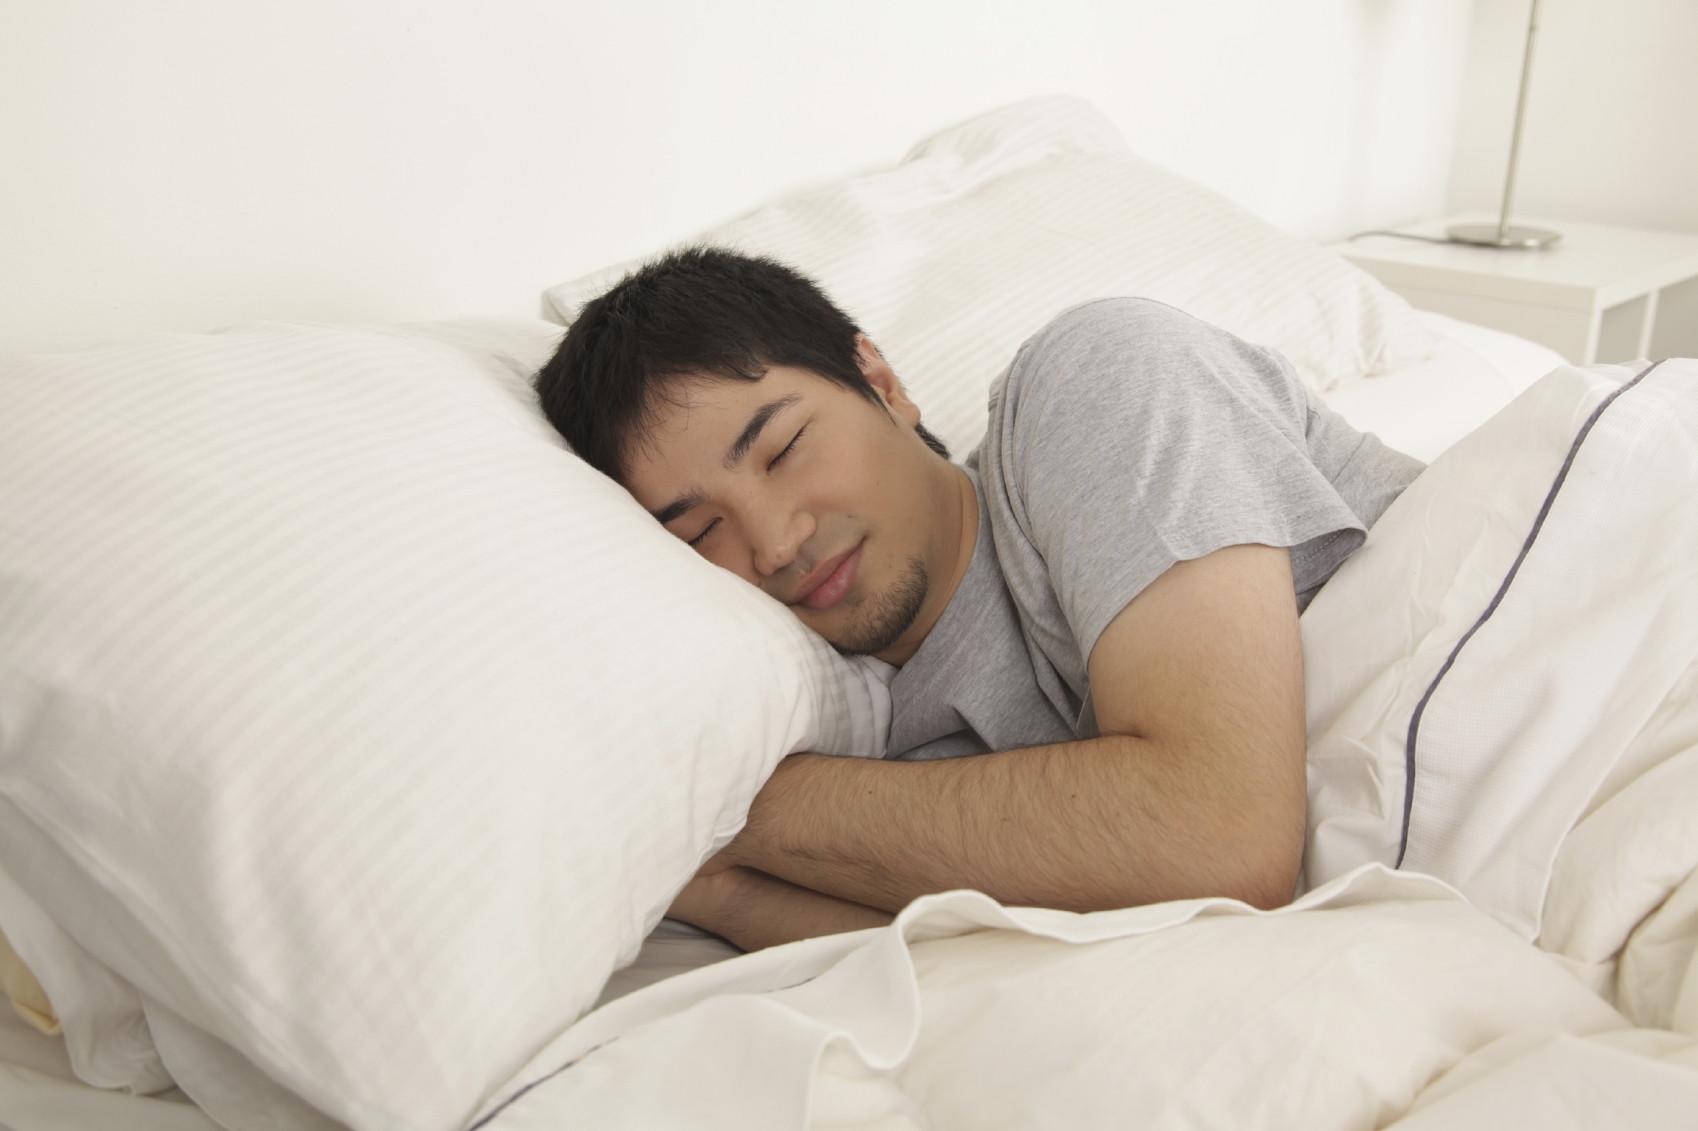 man-sleeping-rest-tirediStock_000068546295_Medium